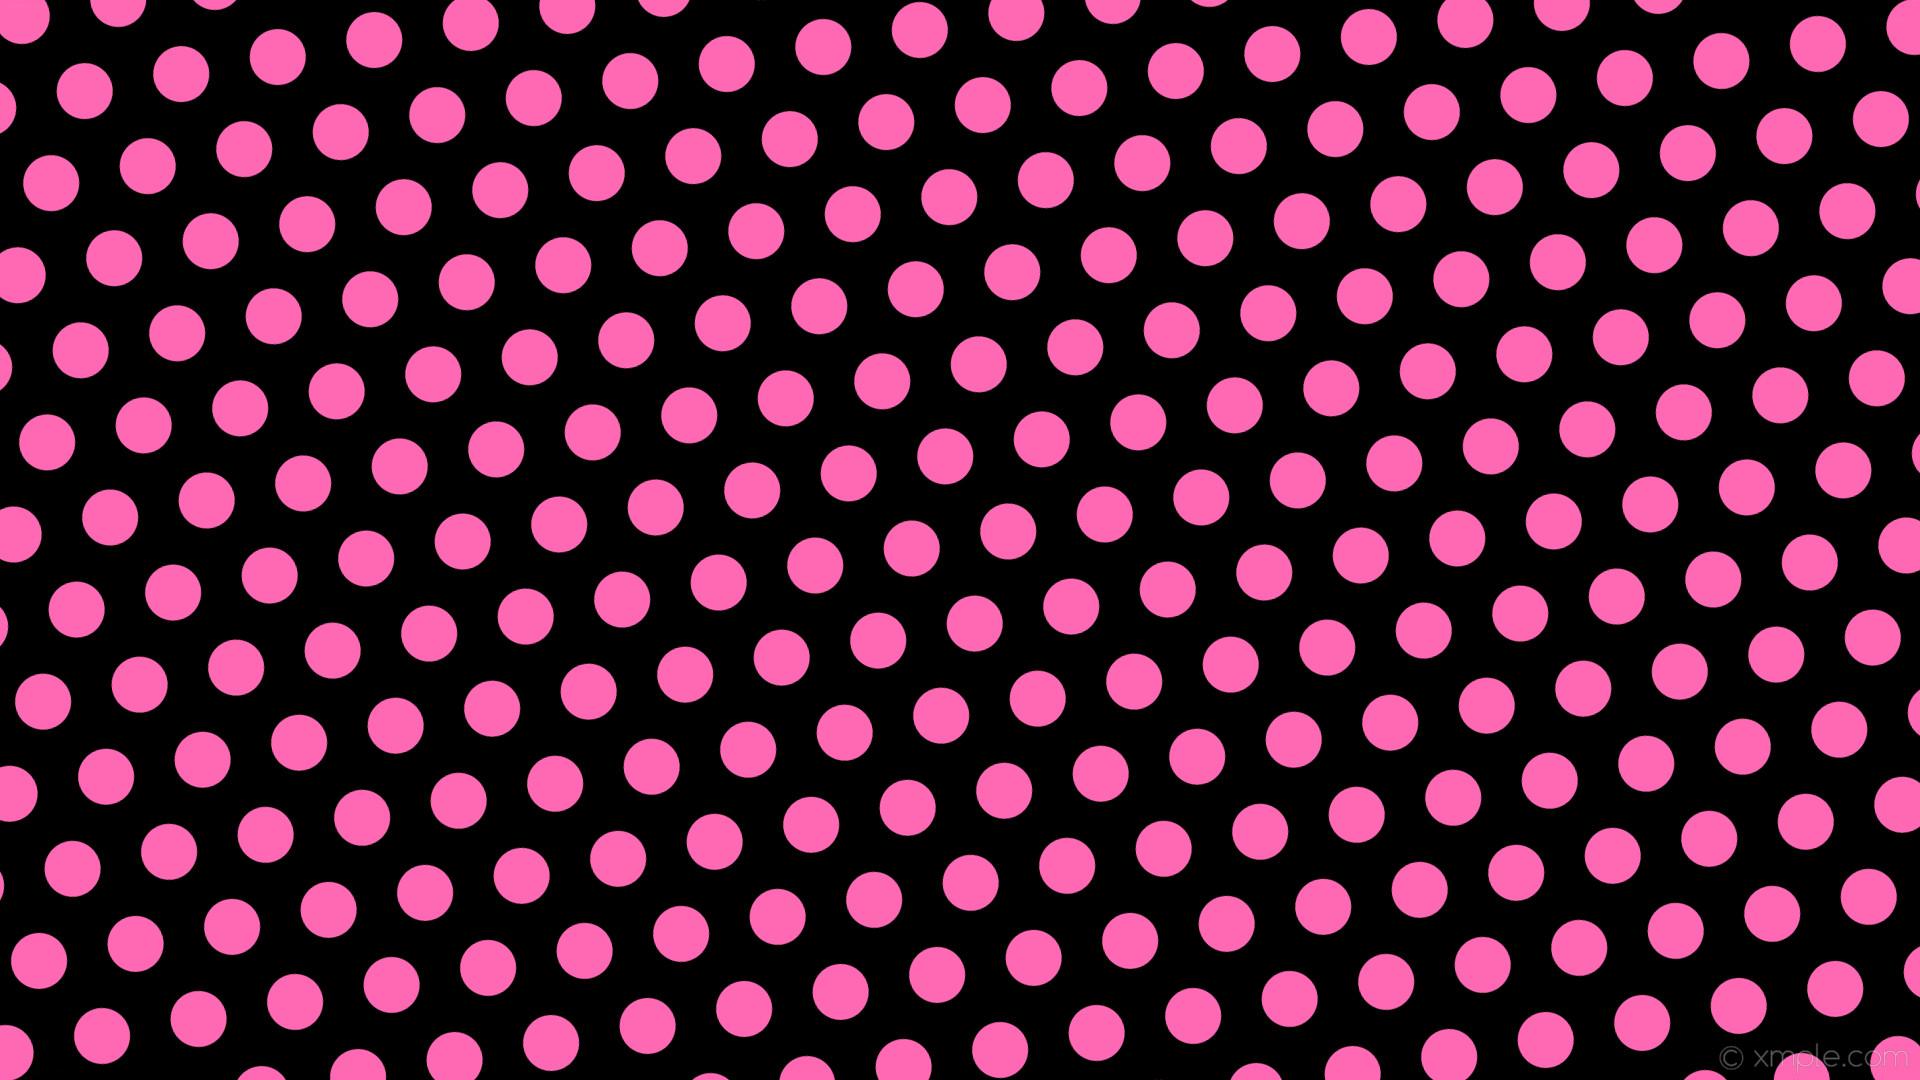 wallpaper pink hexagon black polka dots hot pink #000000 #ff69b4 diagonal  10° 56px